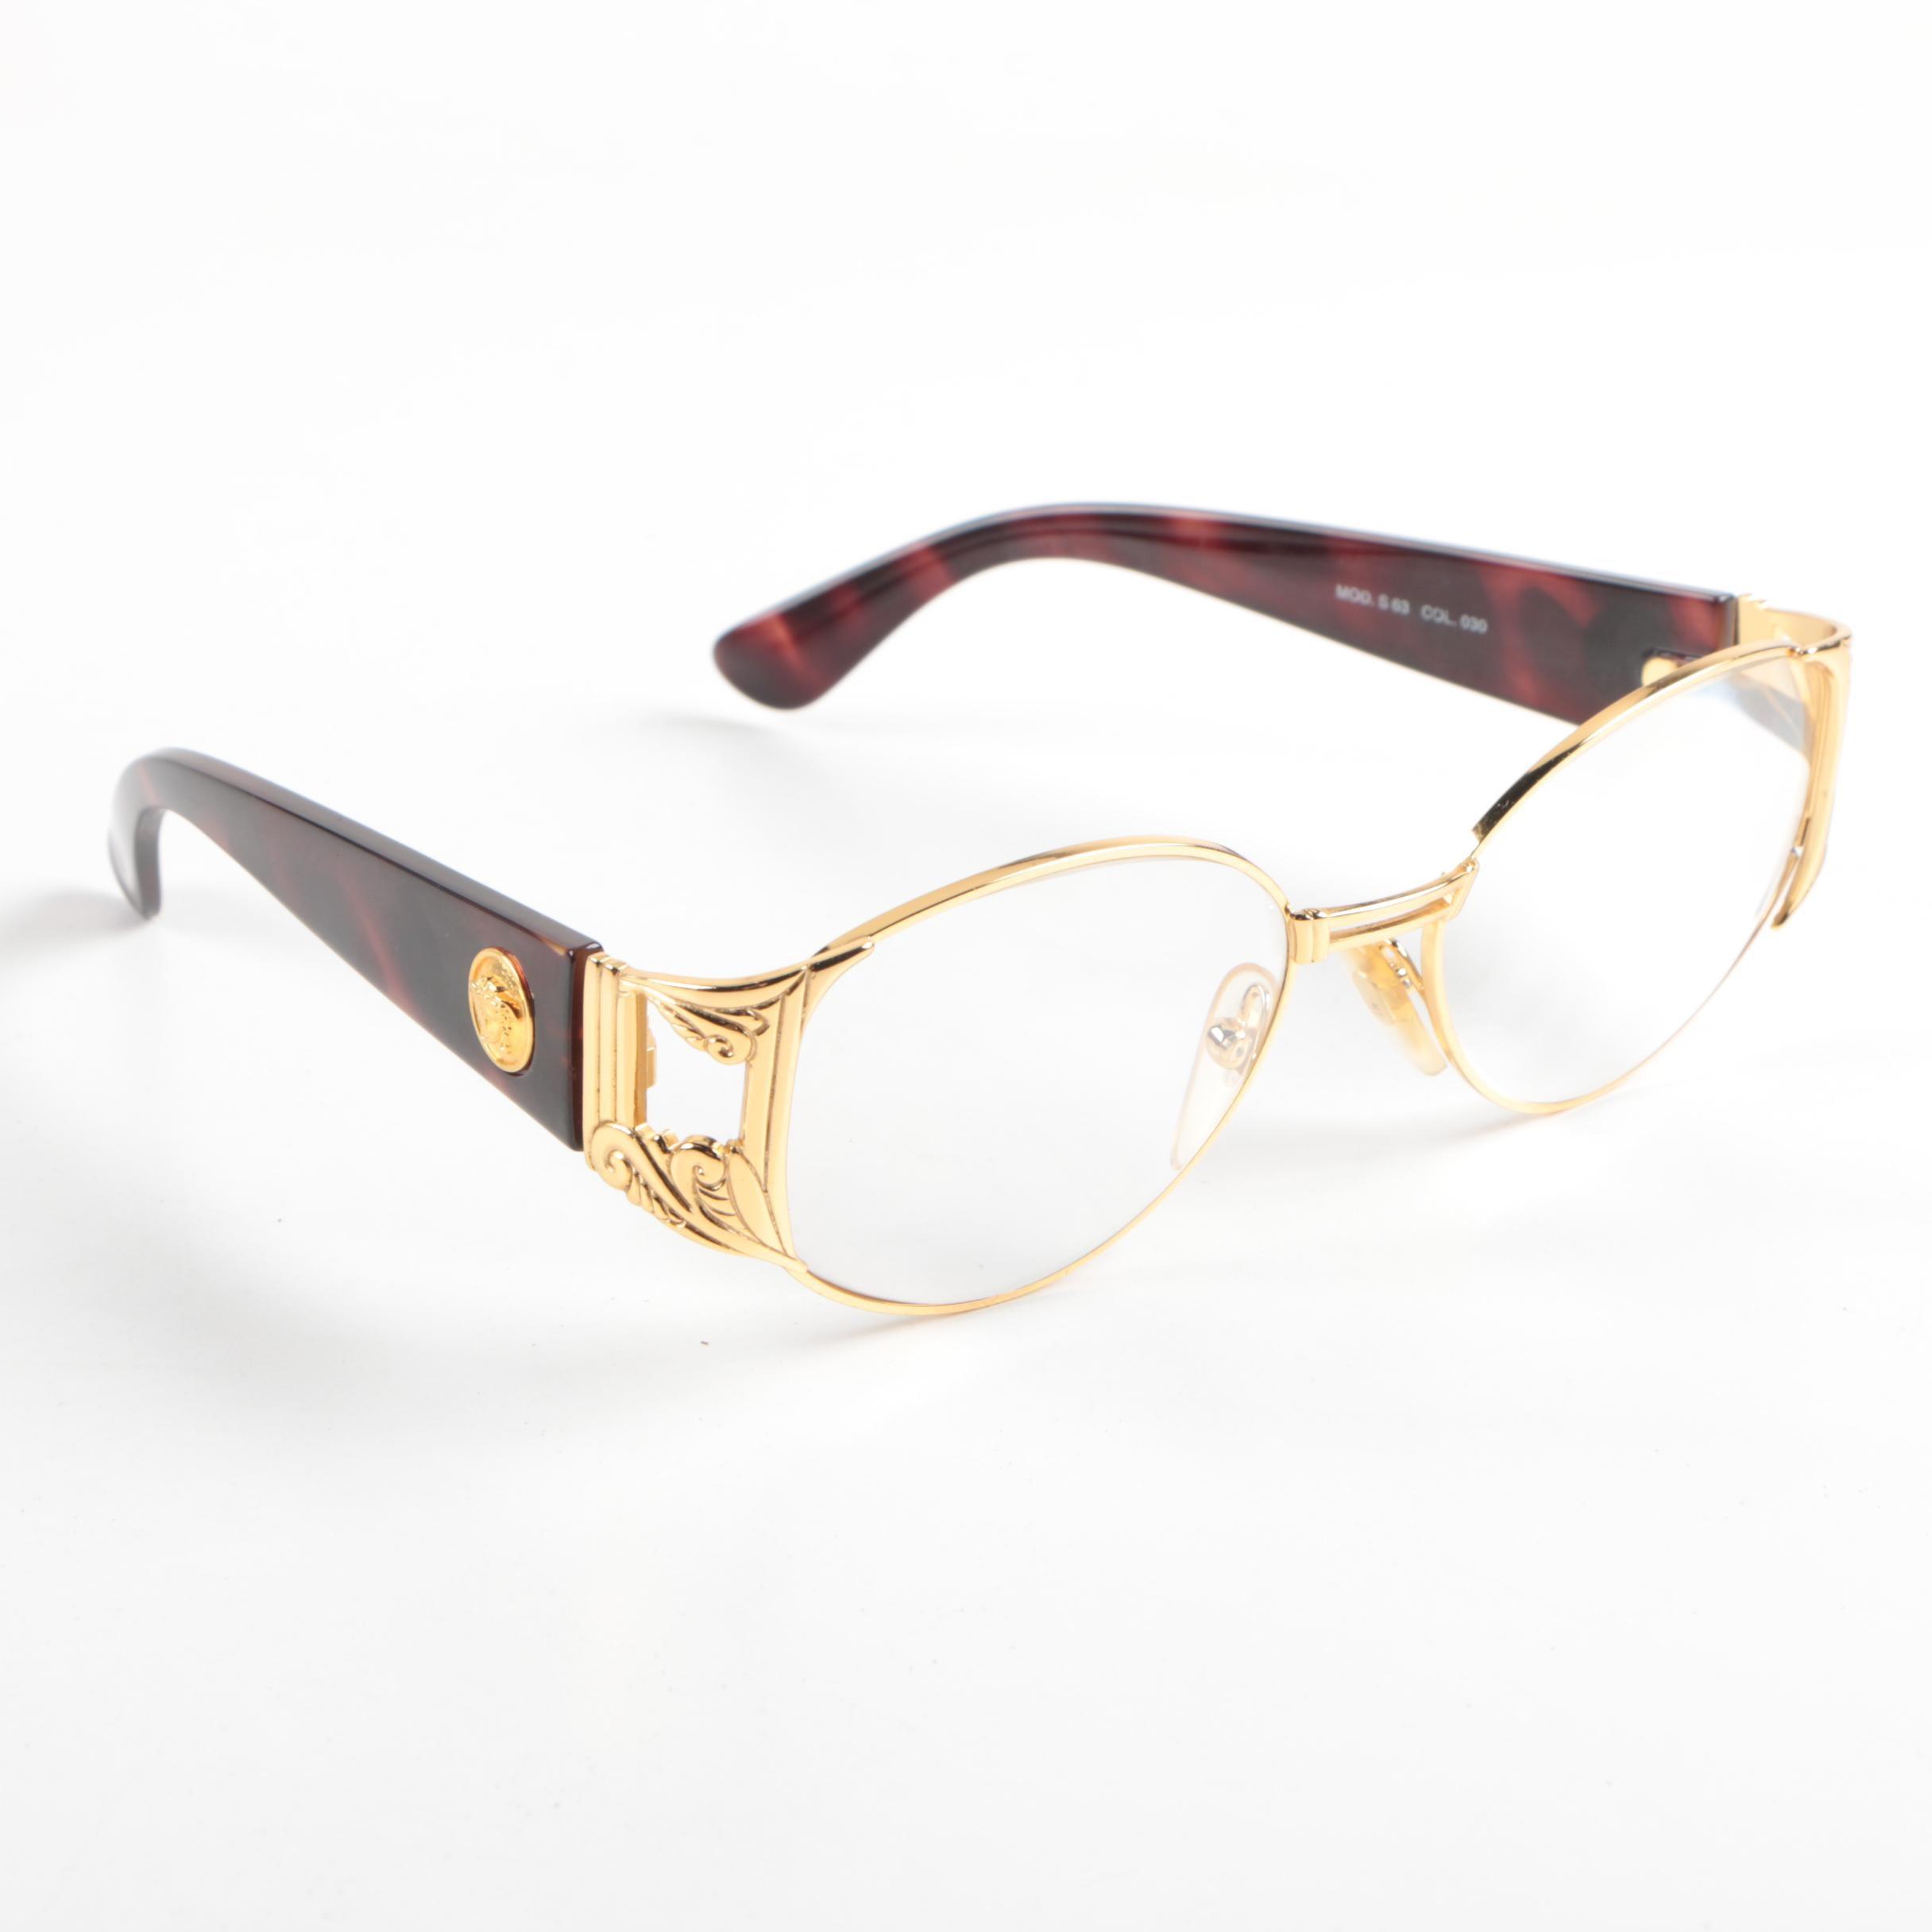 Gianni Versace Prescription Gold Tone and Plastic Framed Eyeglasses